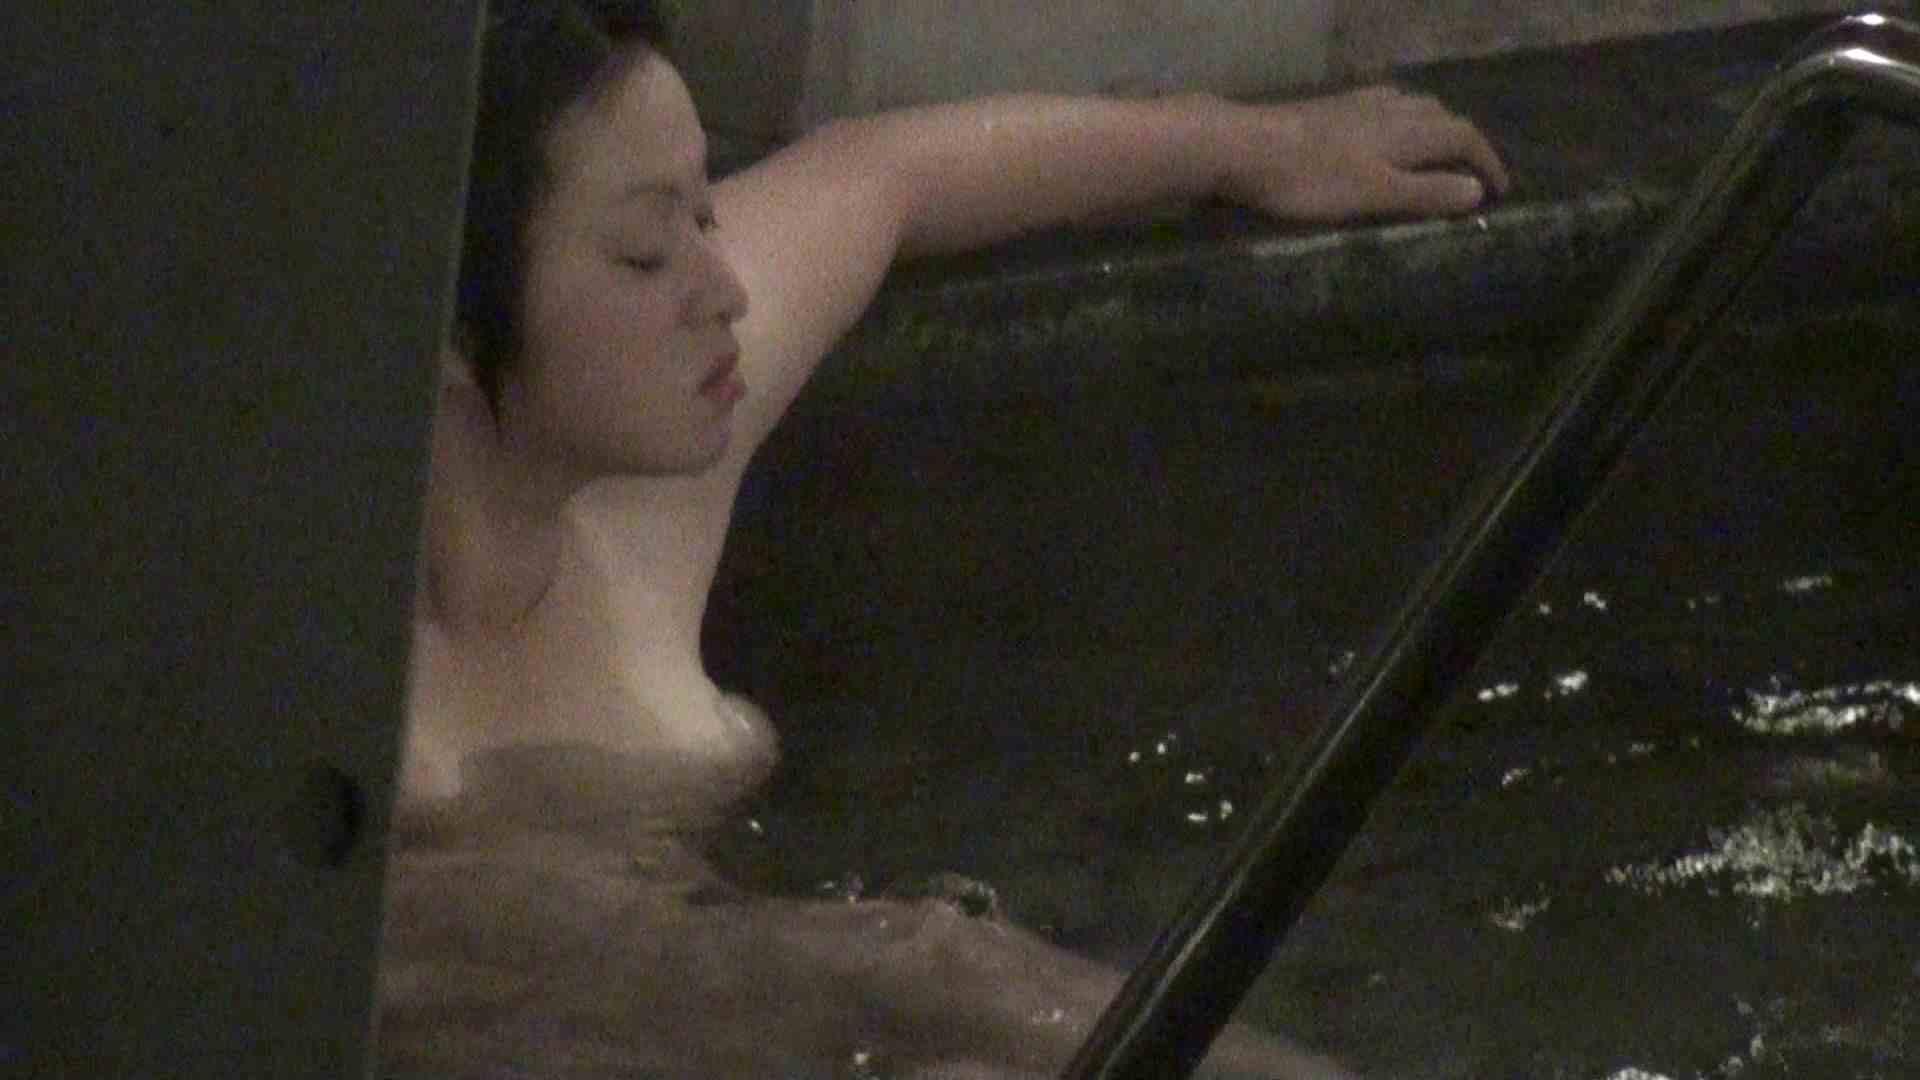 Aquaな露天風呂Vol.338 露天風呂編 | 盗撮シリーズ  82PIX 41